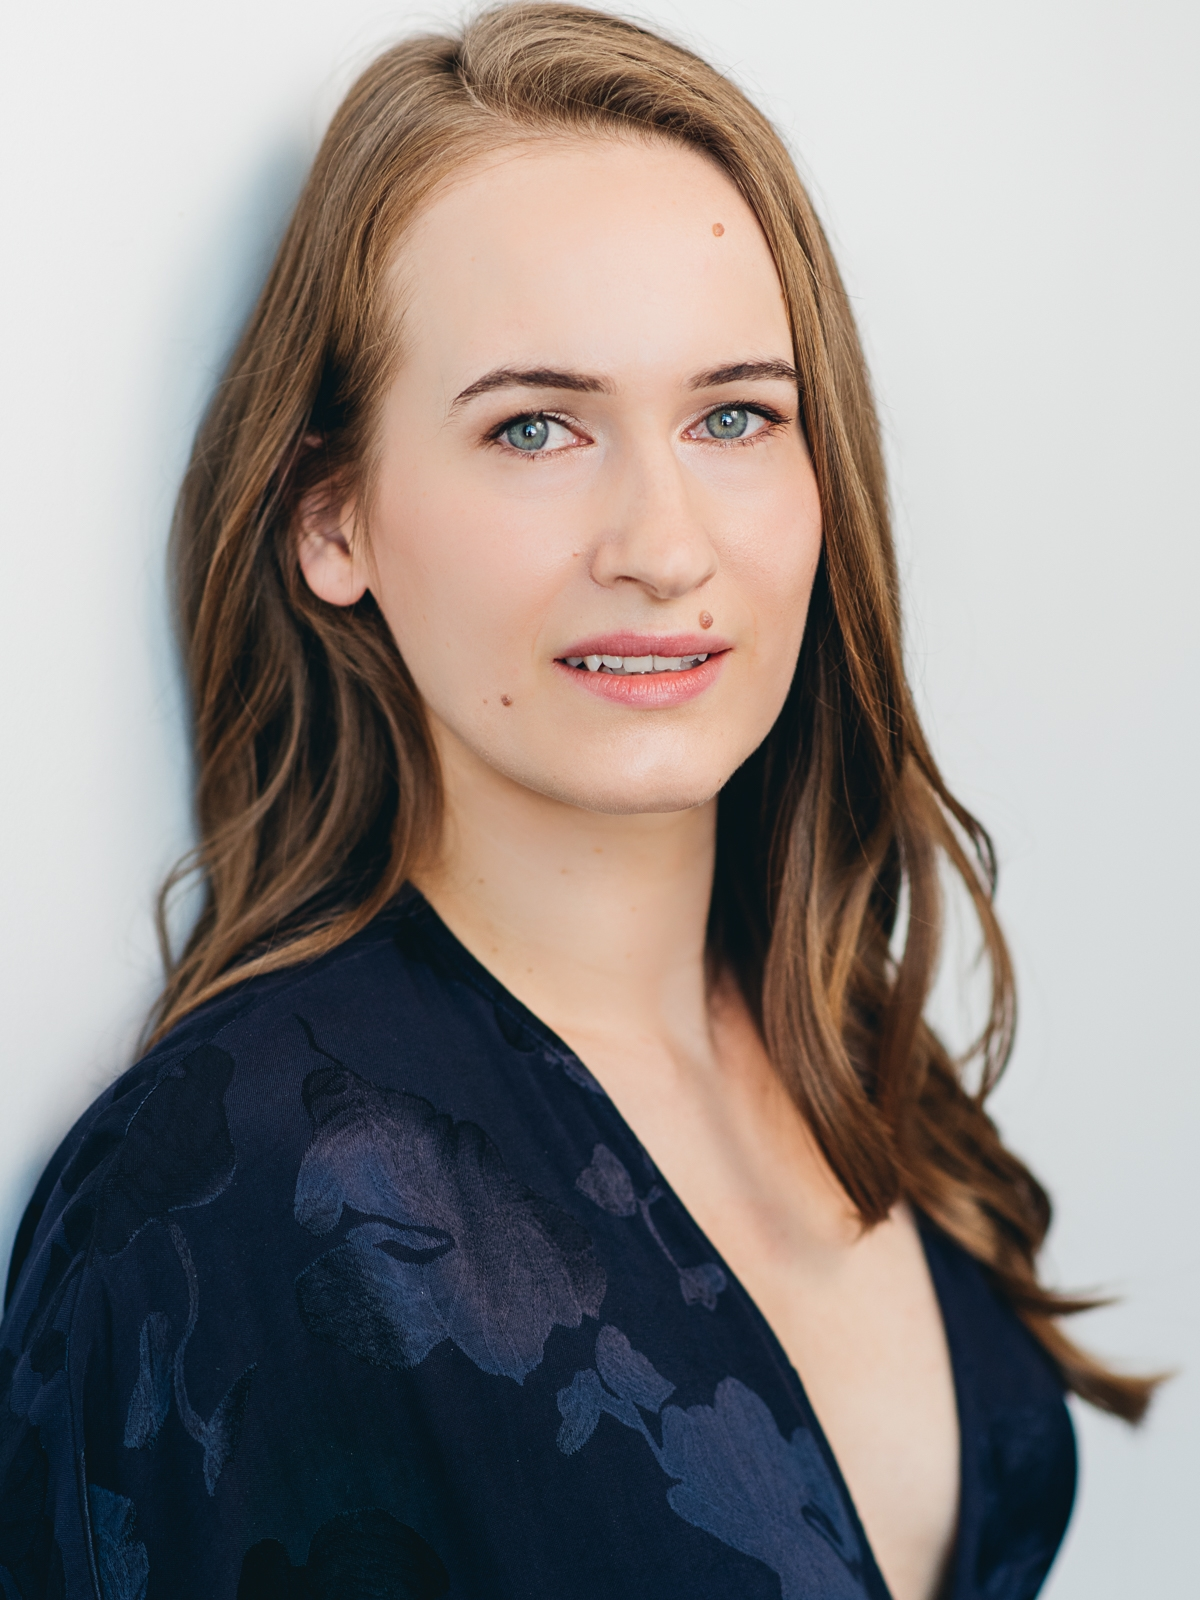 CarolineSawyer-LVIMAGERY-3.JPG